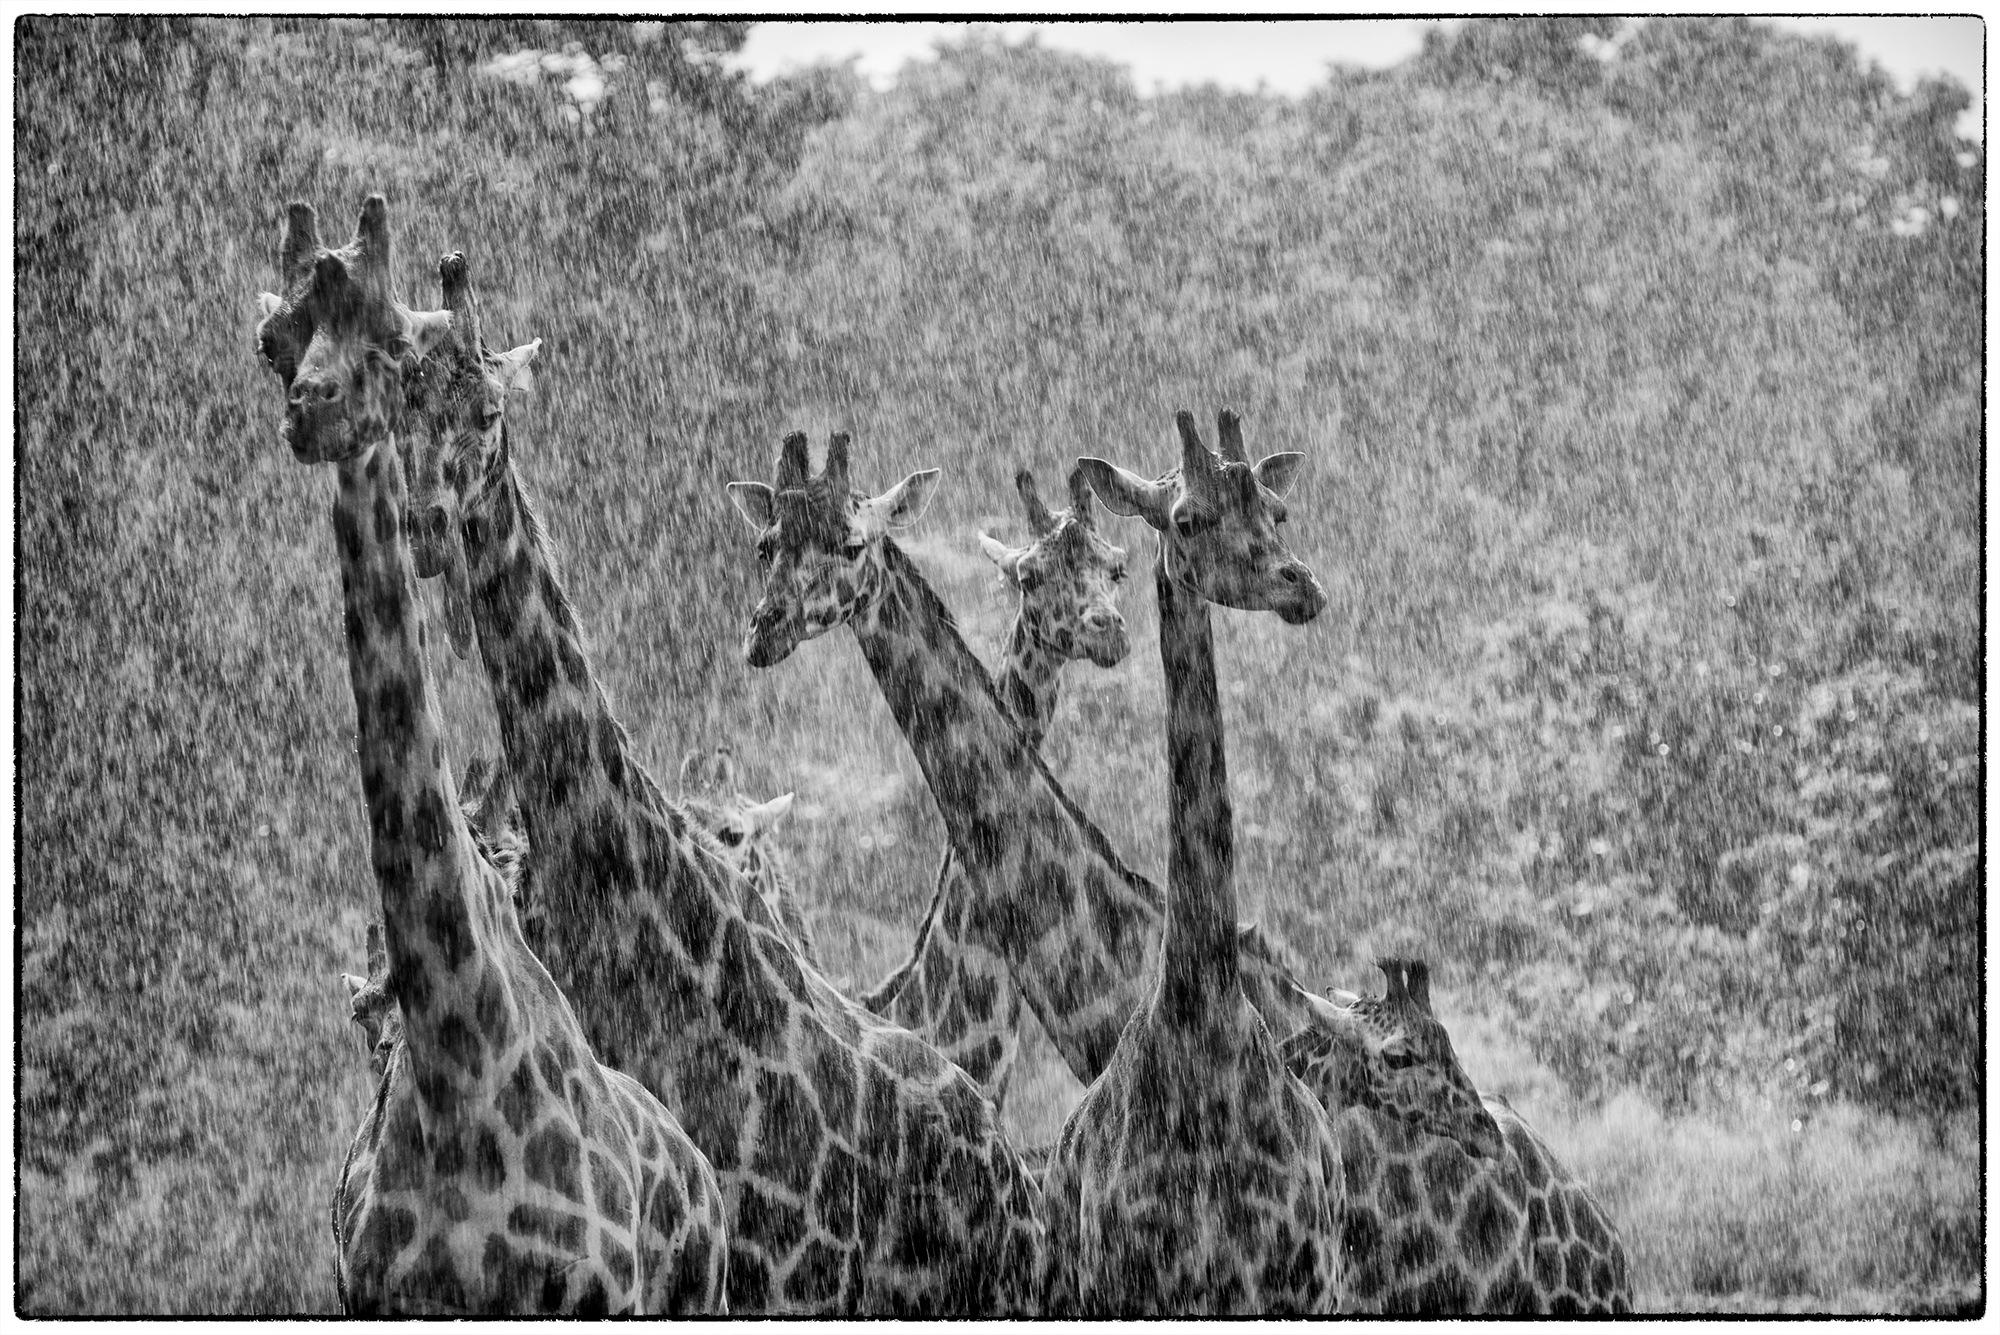 Giraffes in the rain by desmcmahon5